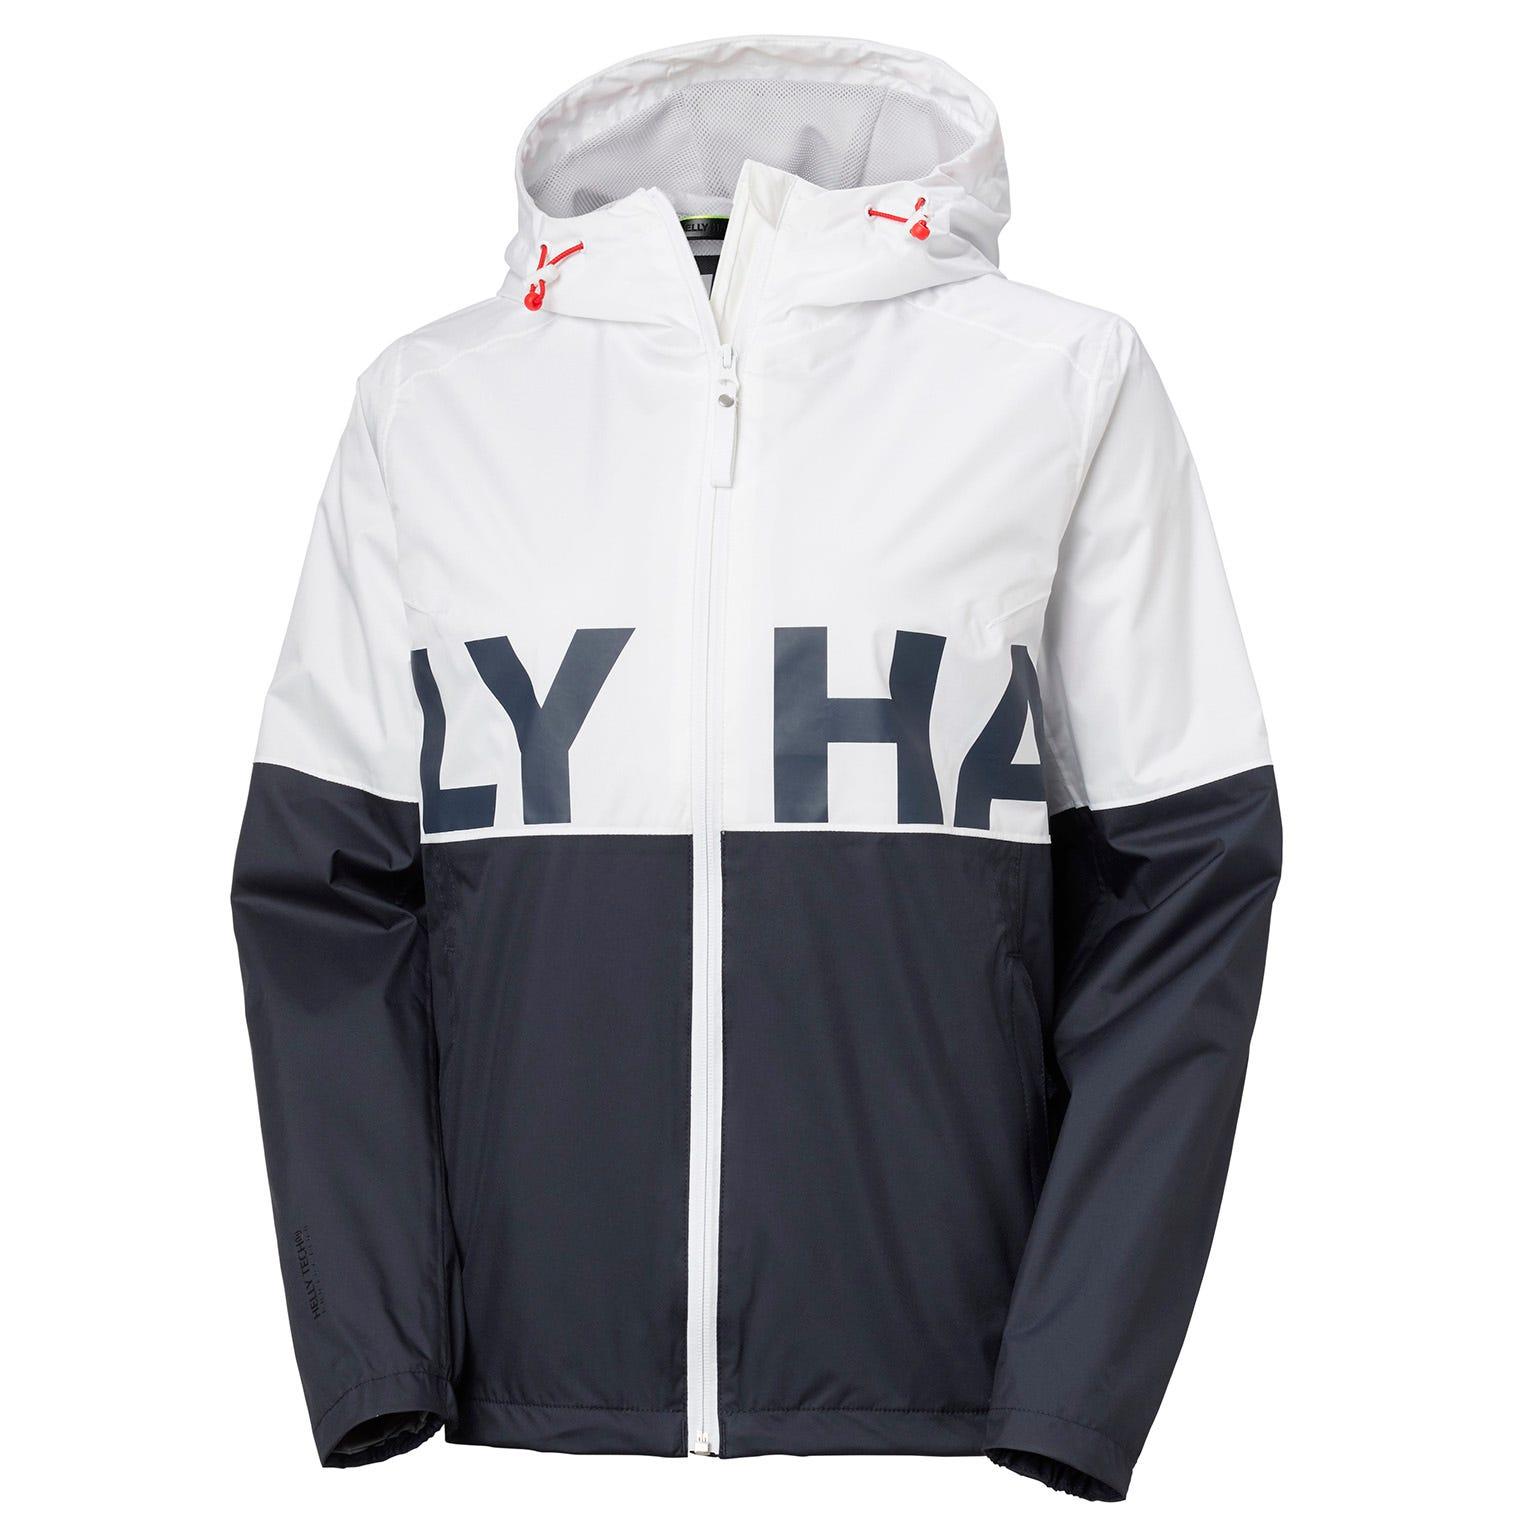 Helly Hansen Womens Amuze 90s Inspired Rain Jacket White M